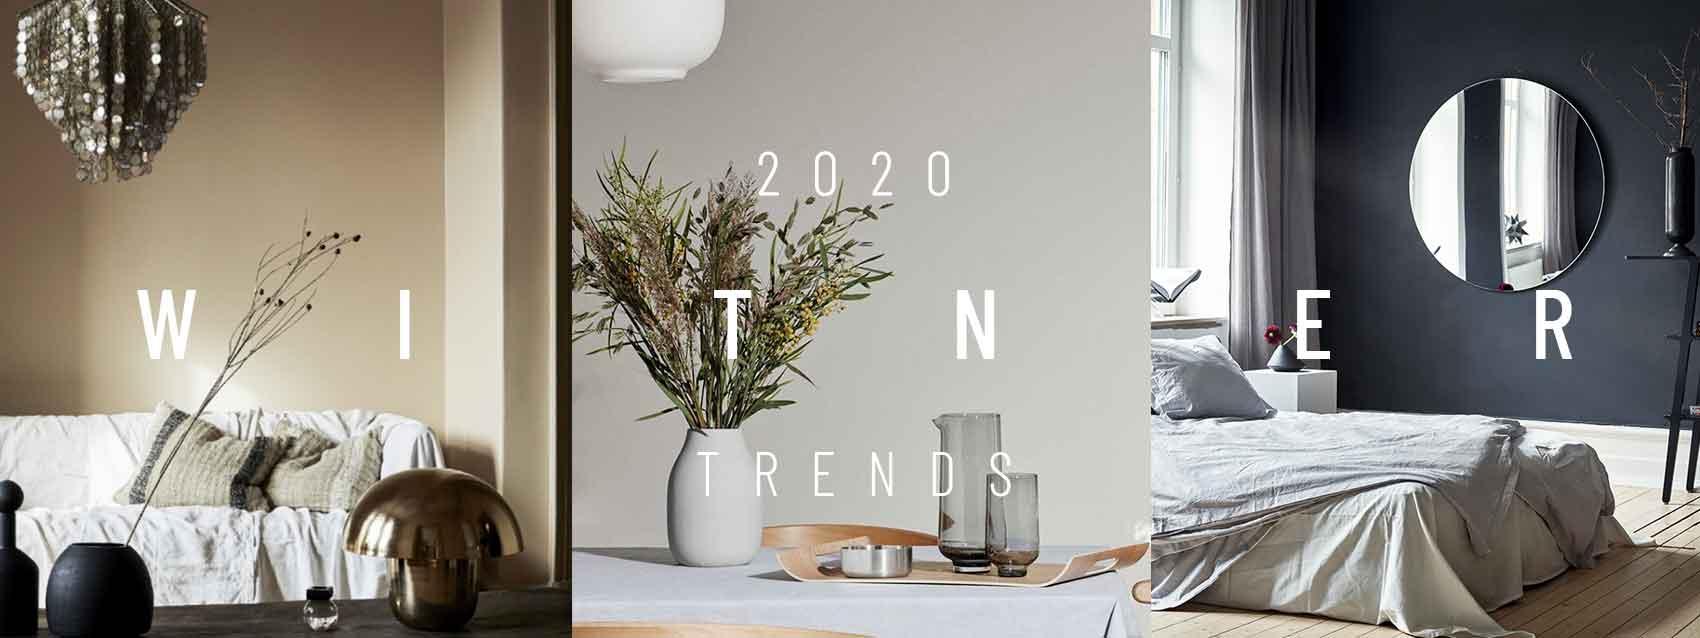 Inredning 2020